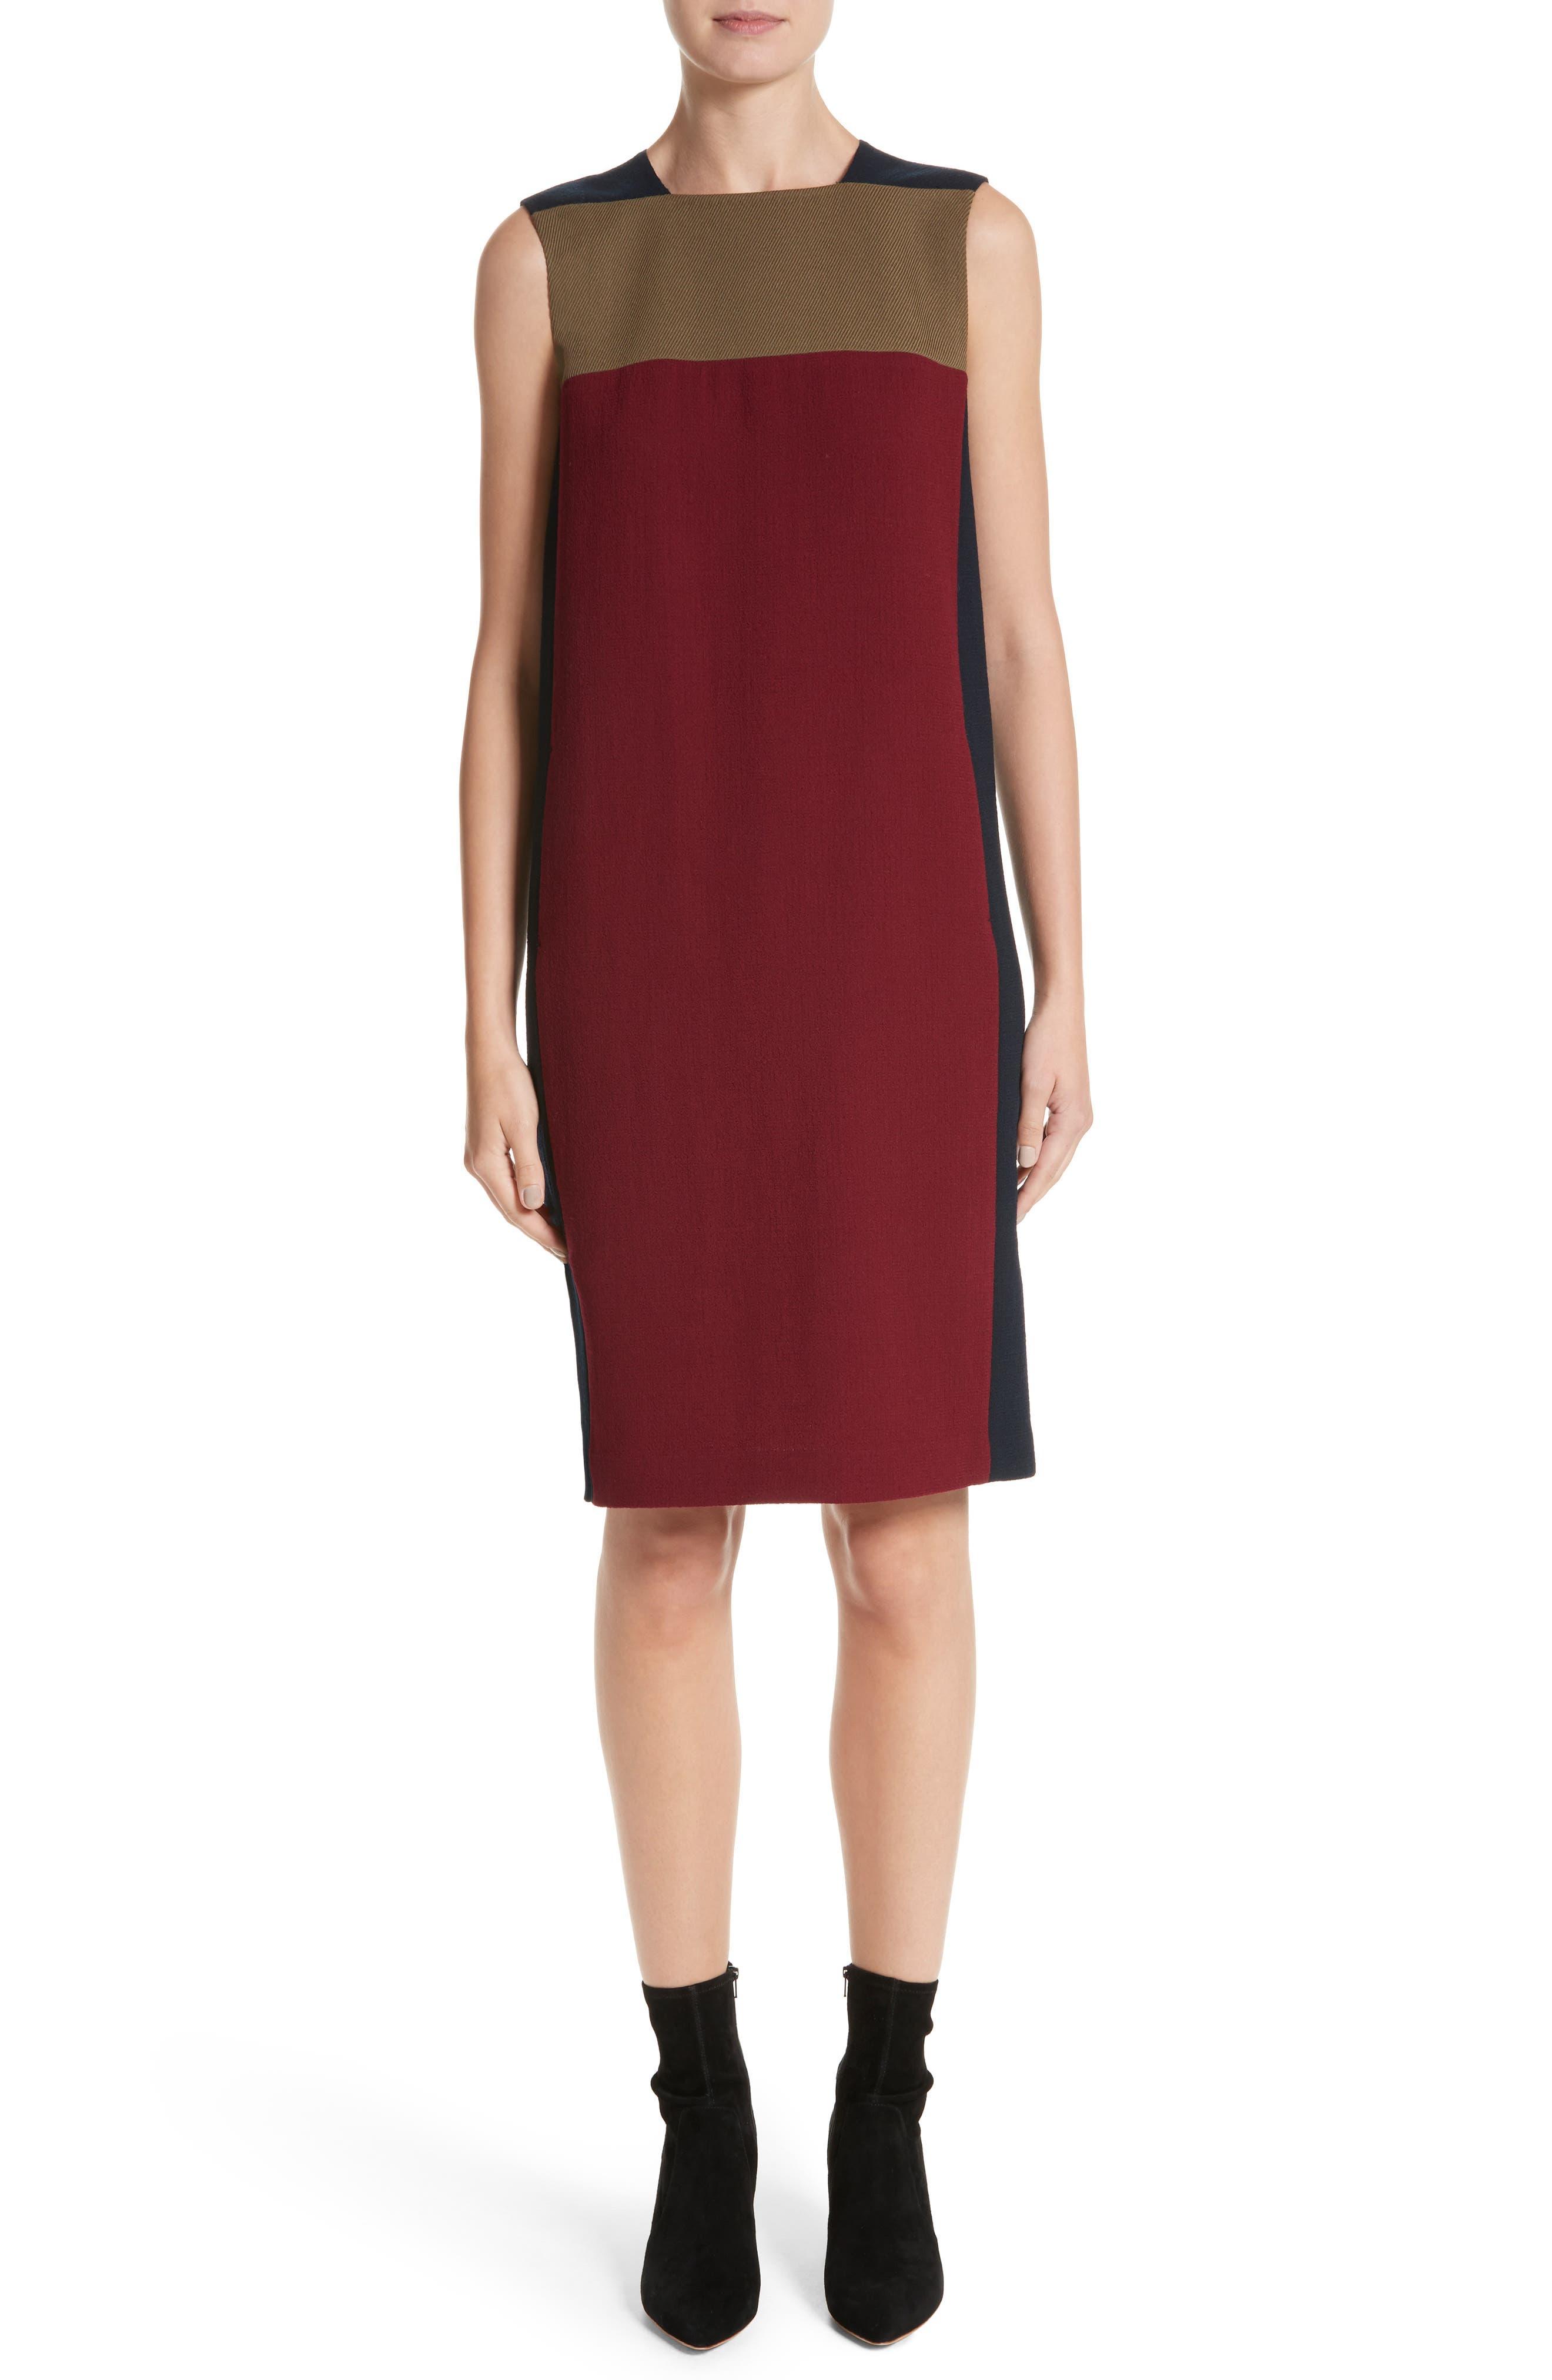 Alternate Image 1 Selected - Lafayette 148 New York Zandra Colorblock Nouveau Crepe Dress